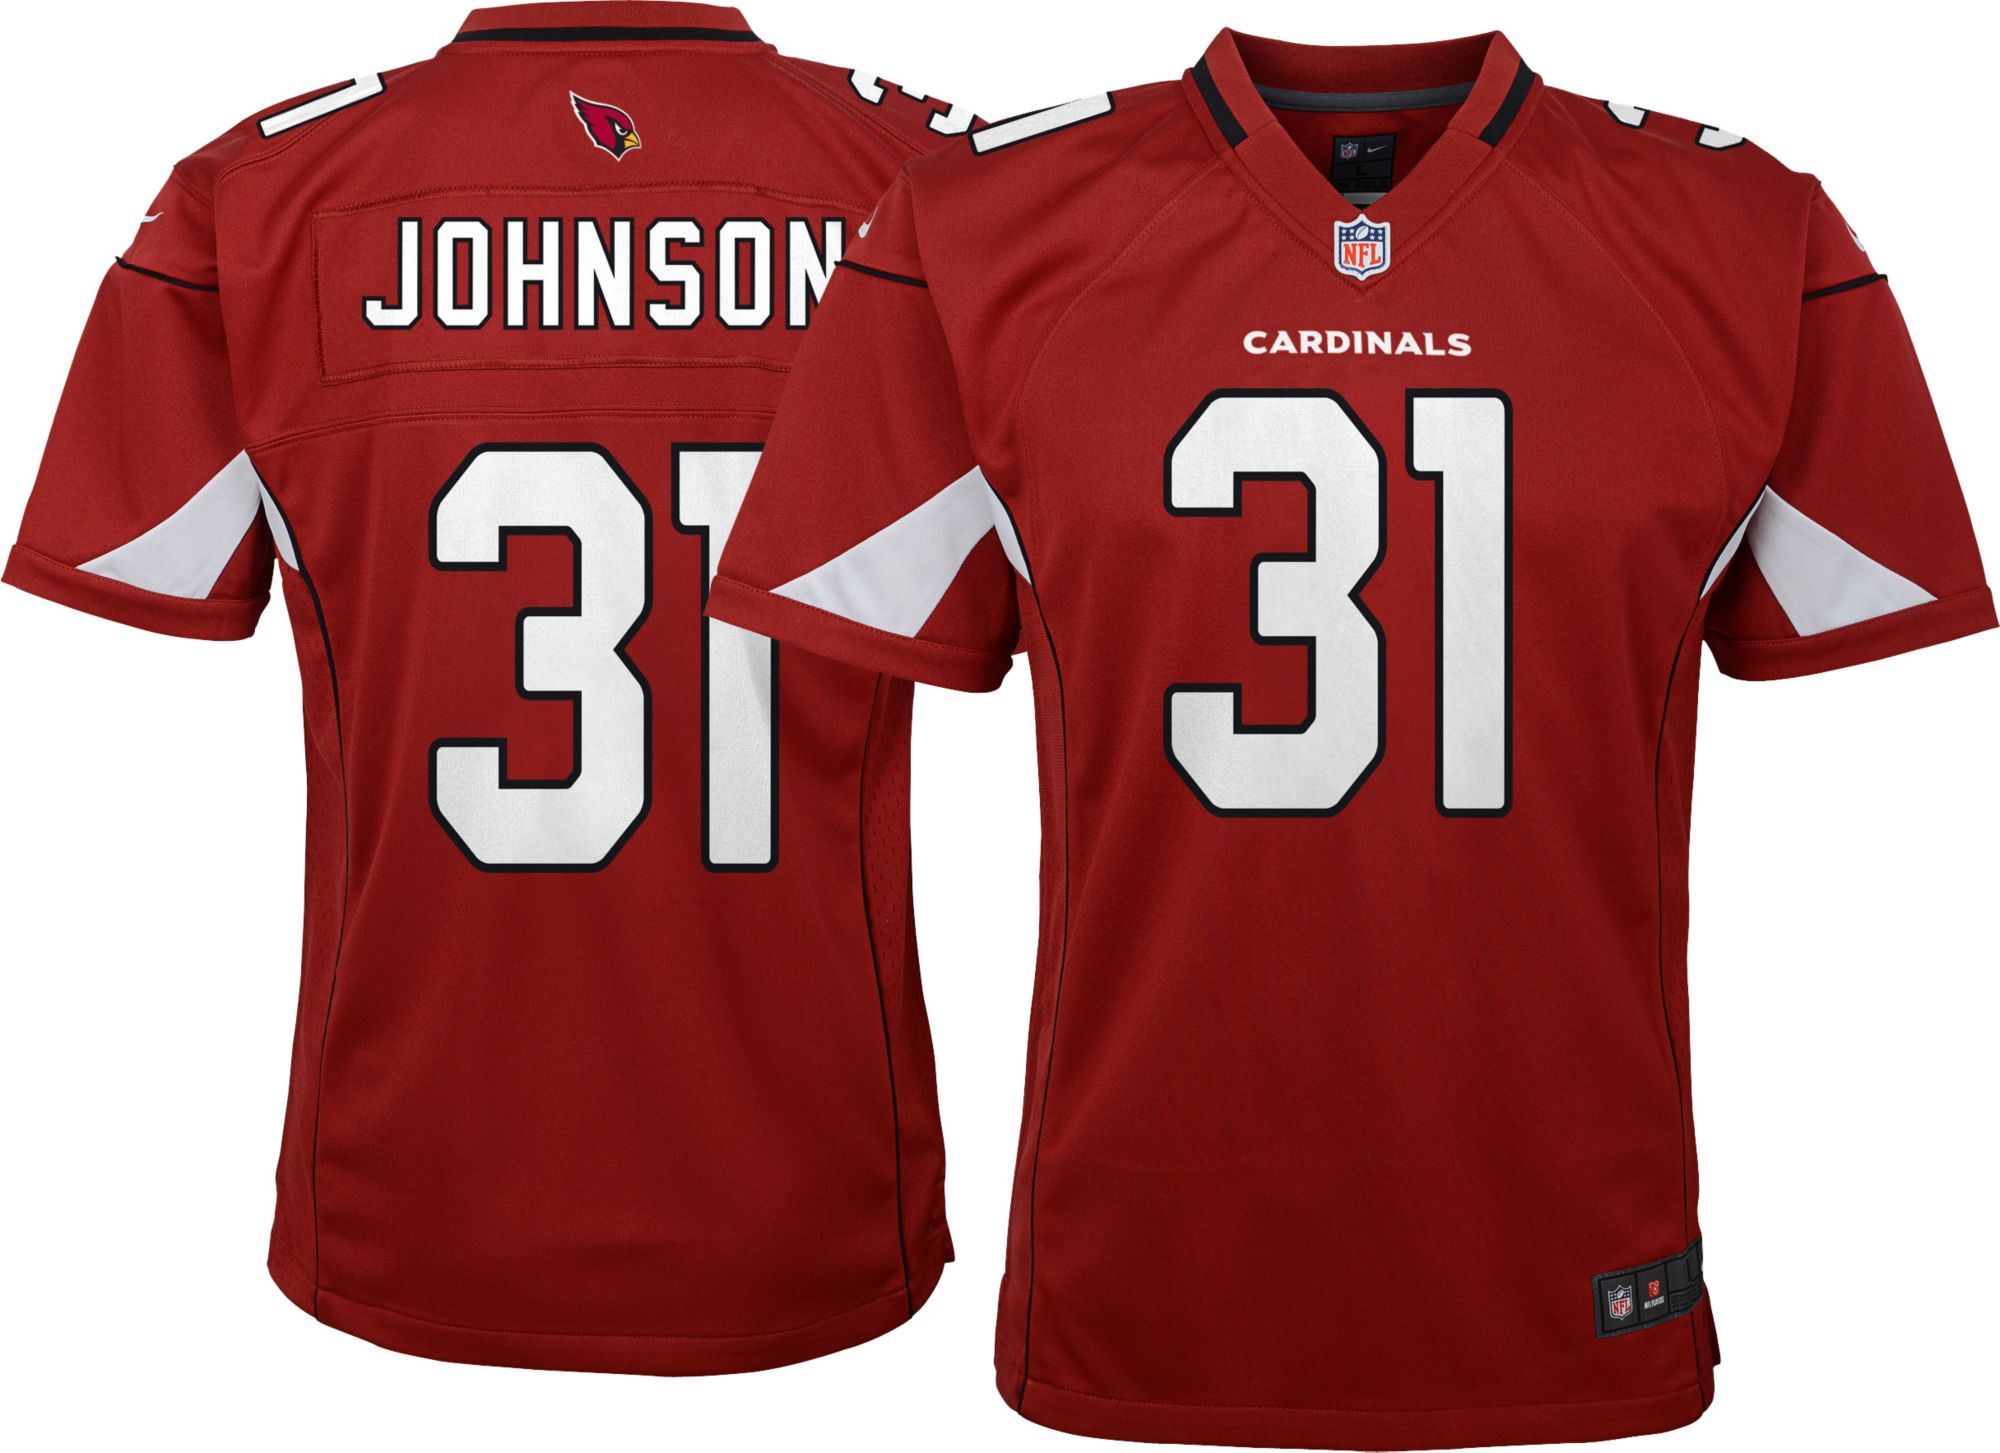 david johnson jersey cheap